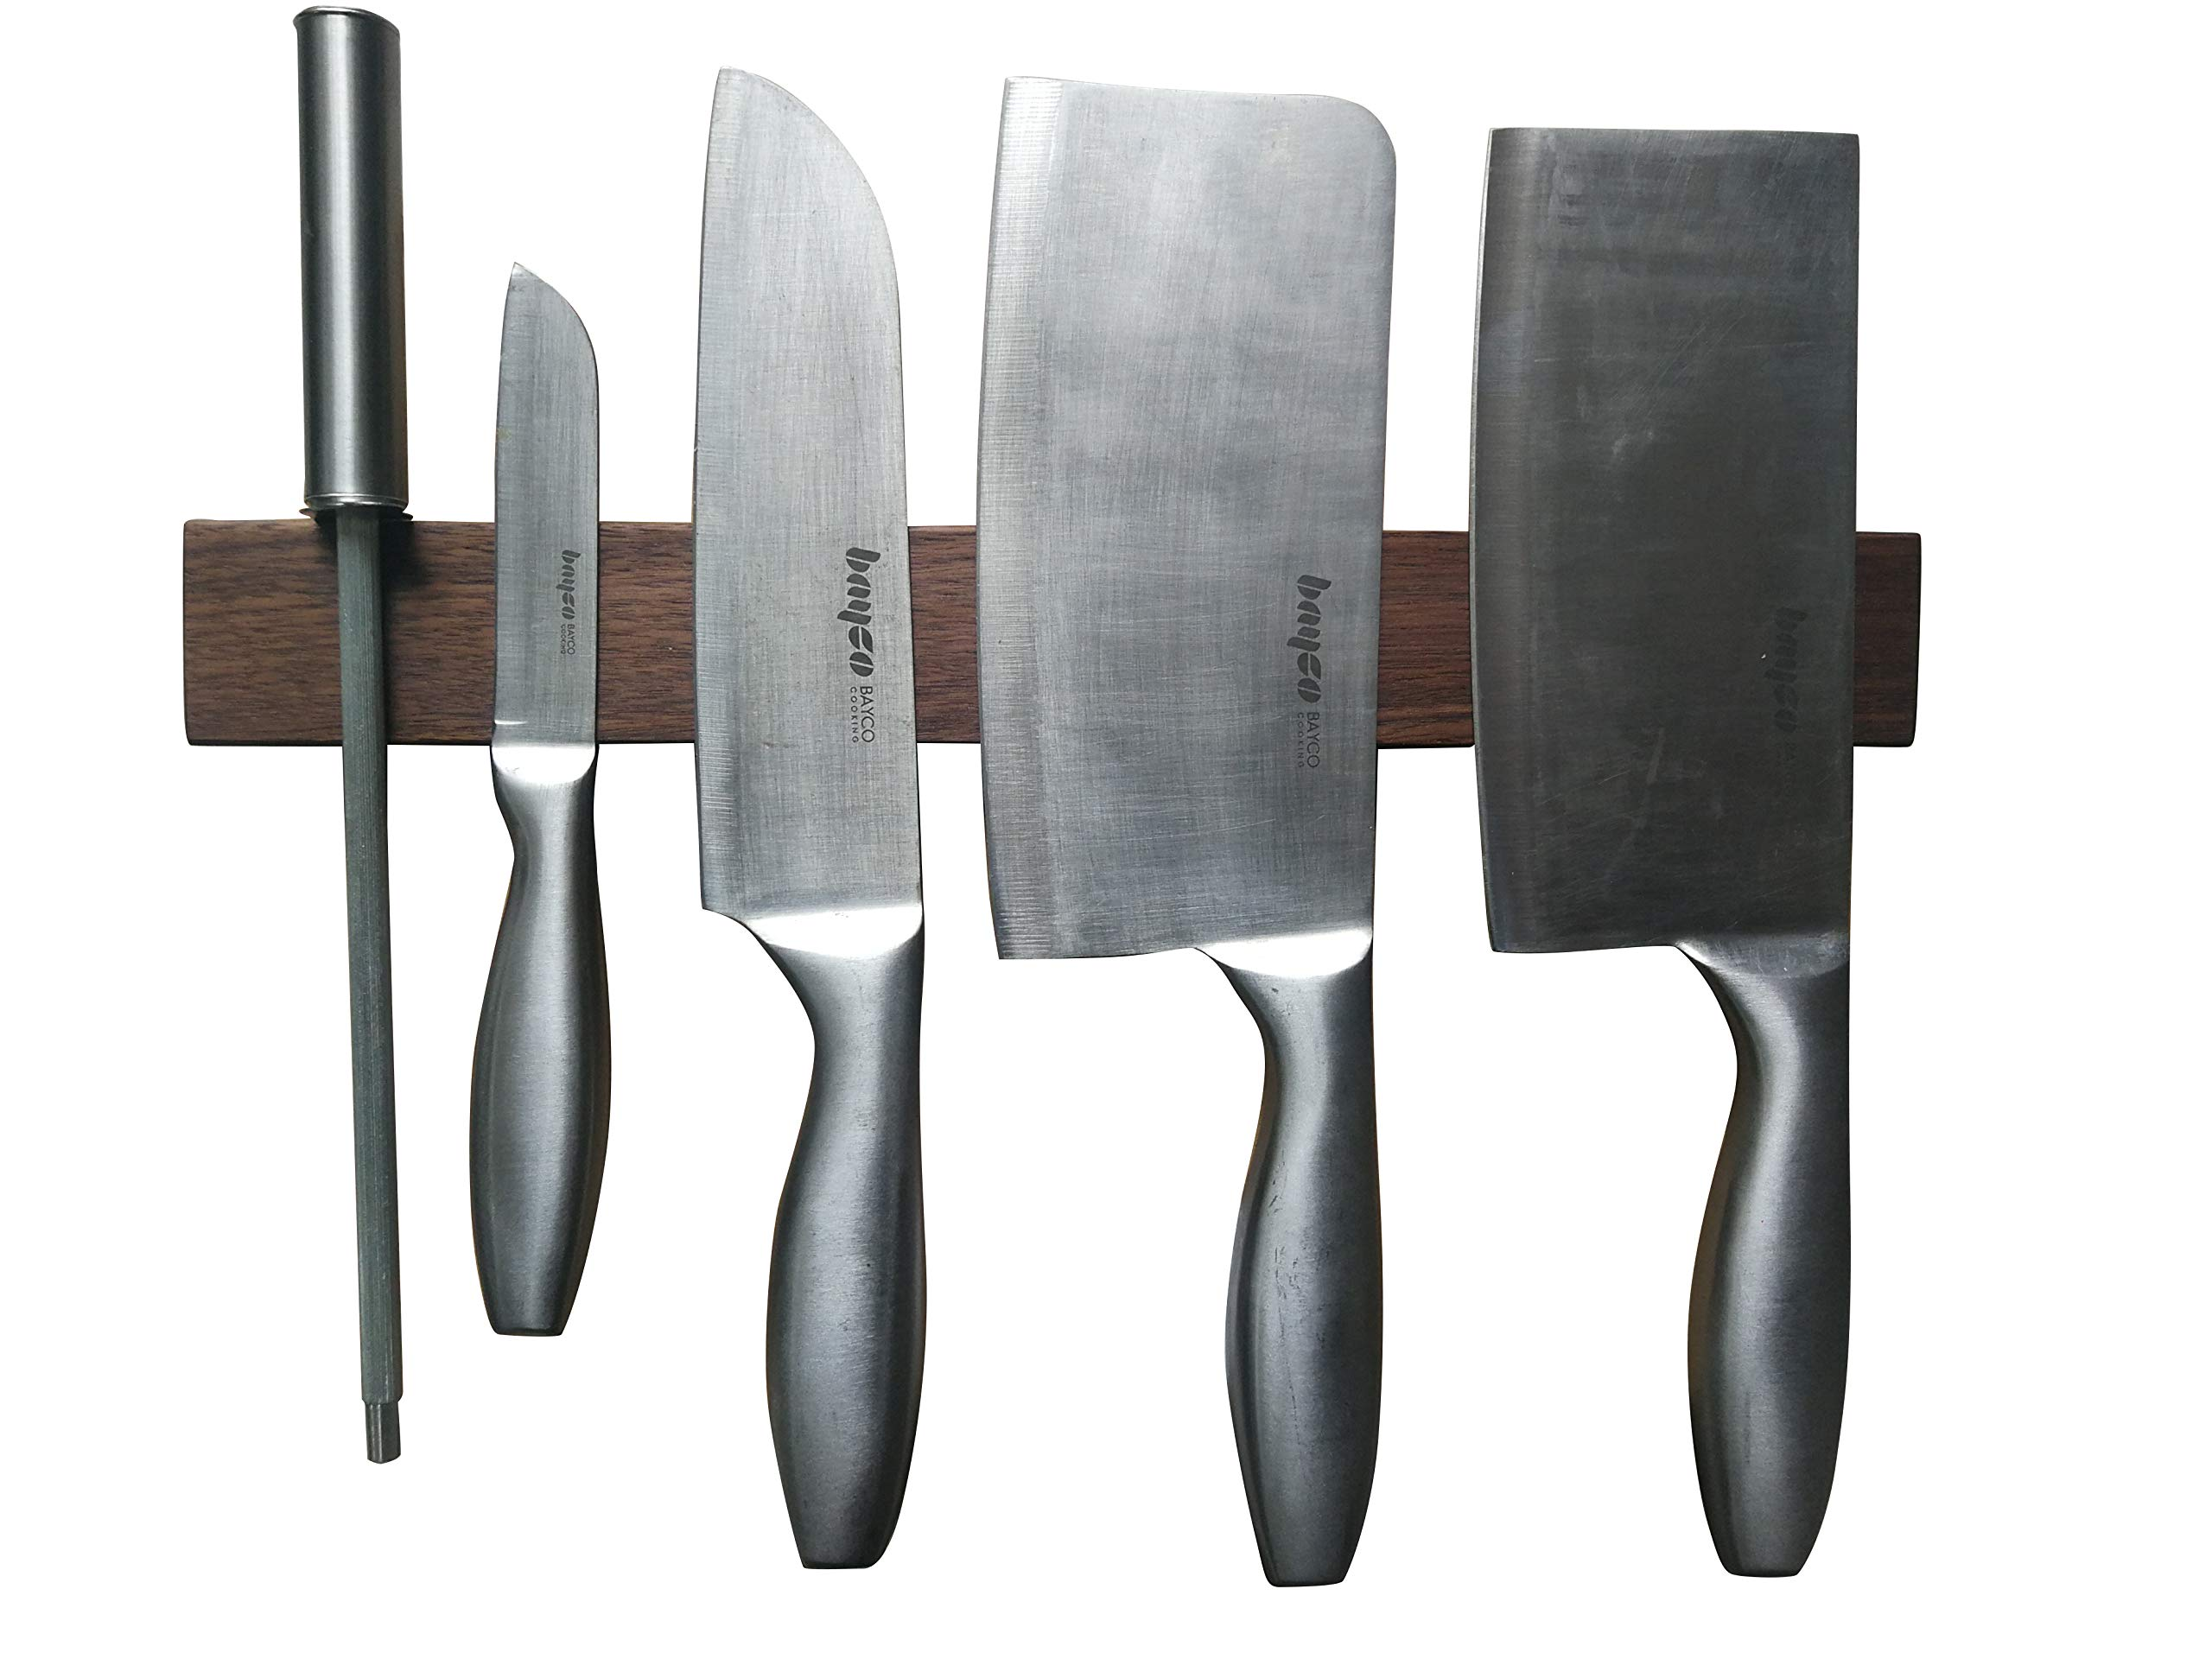 Seatrend Walnut Wood Magnetic Knife Strips 14 inch,Solid Wall Mount Wooden Knife Rack, Bar, Kitchen Knives Holder Metal Tools Organizer (BackHole)